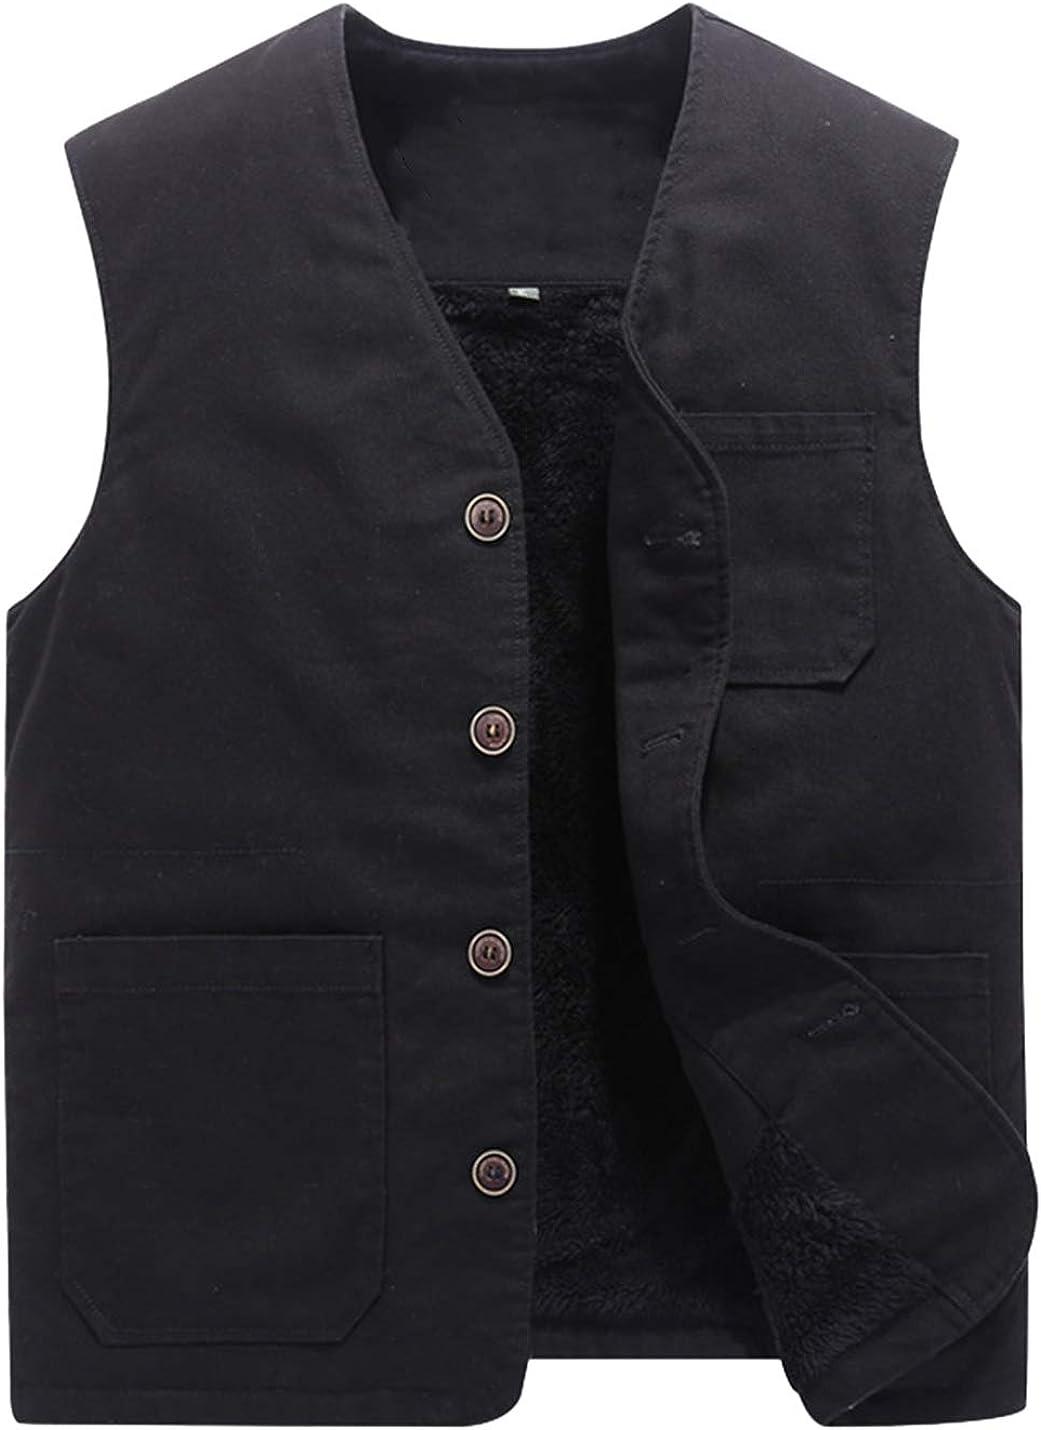 Lentta Men's Casual Fleece Lined Button Up Solid Vest Waistcoat